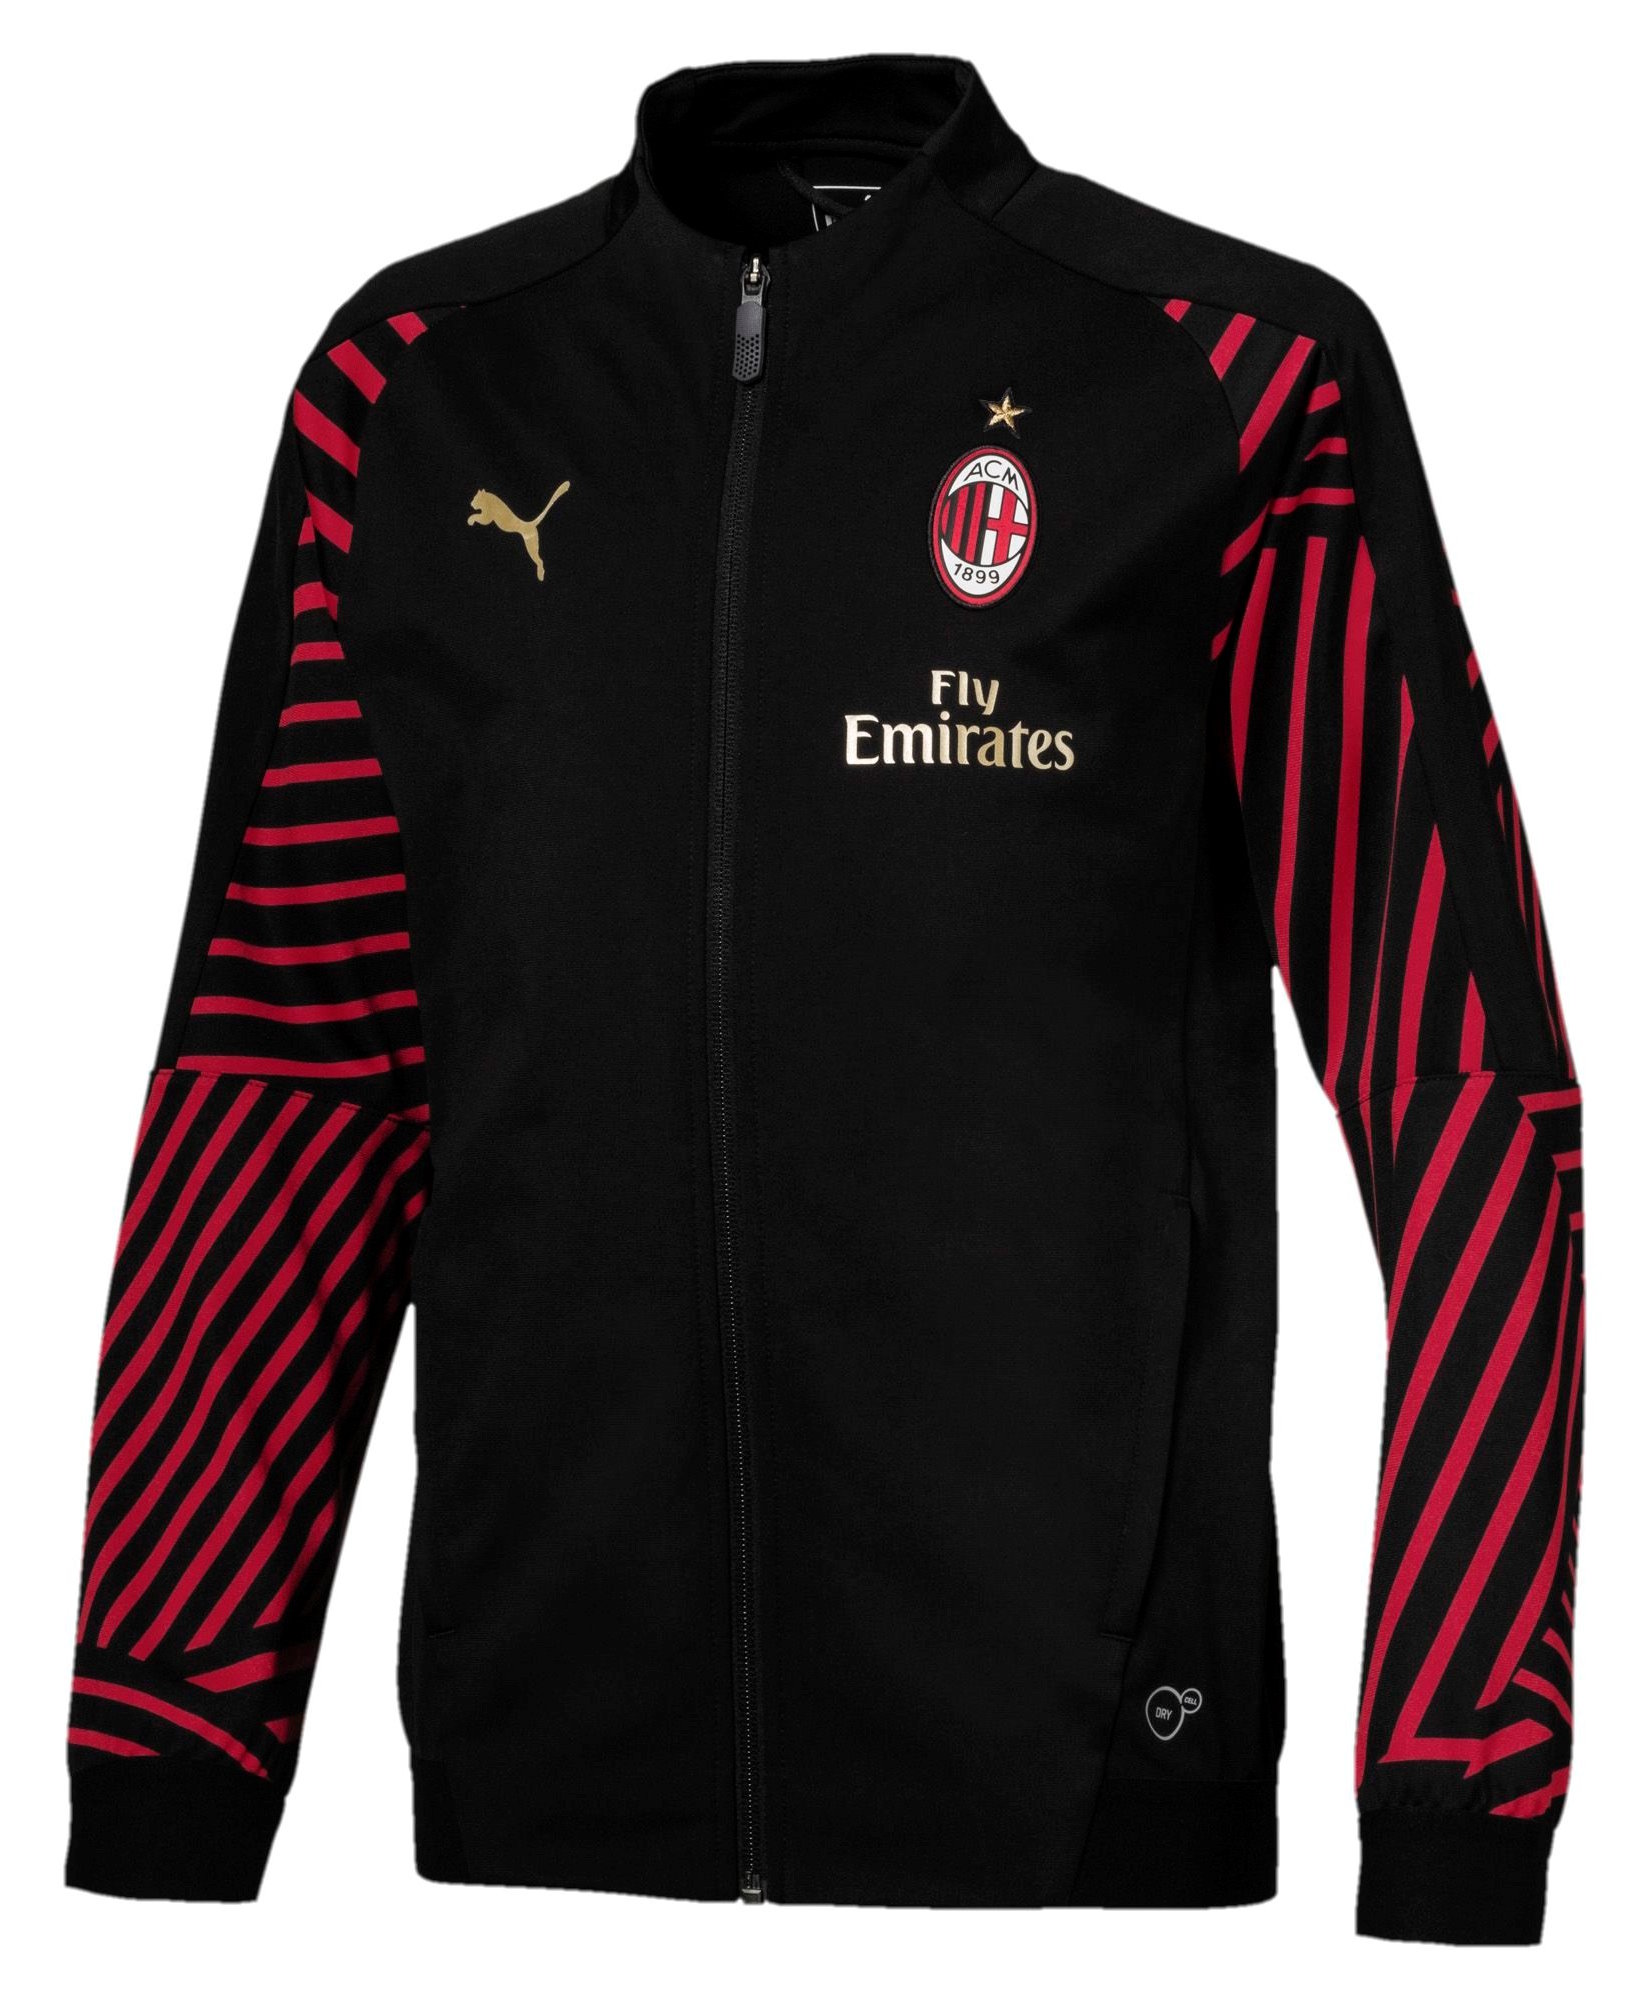 19b8e9531c033 Ac Milan Puma Giacca Tuta Pre Gara Pre Match Jacket Stadium Bambino ...